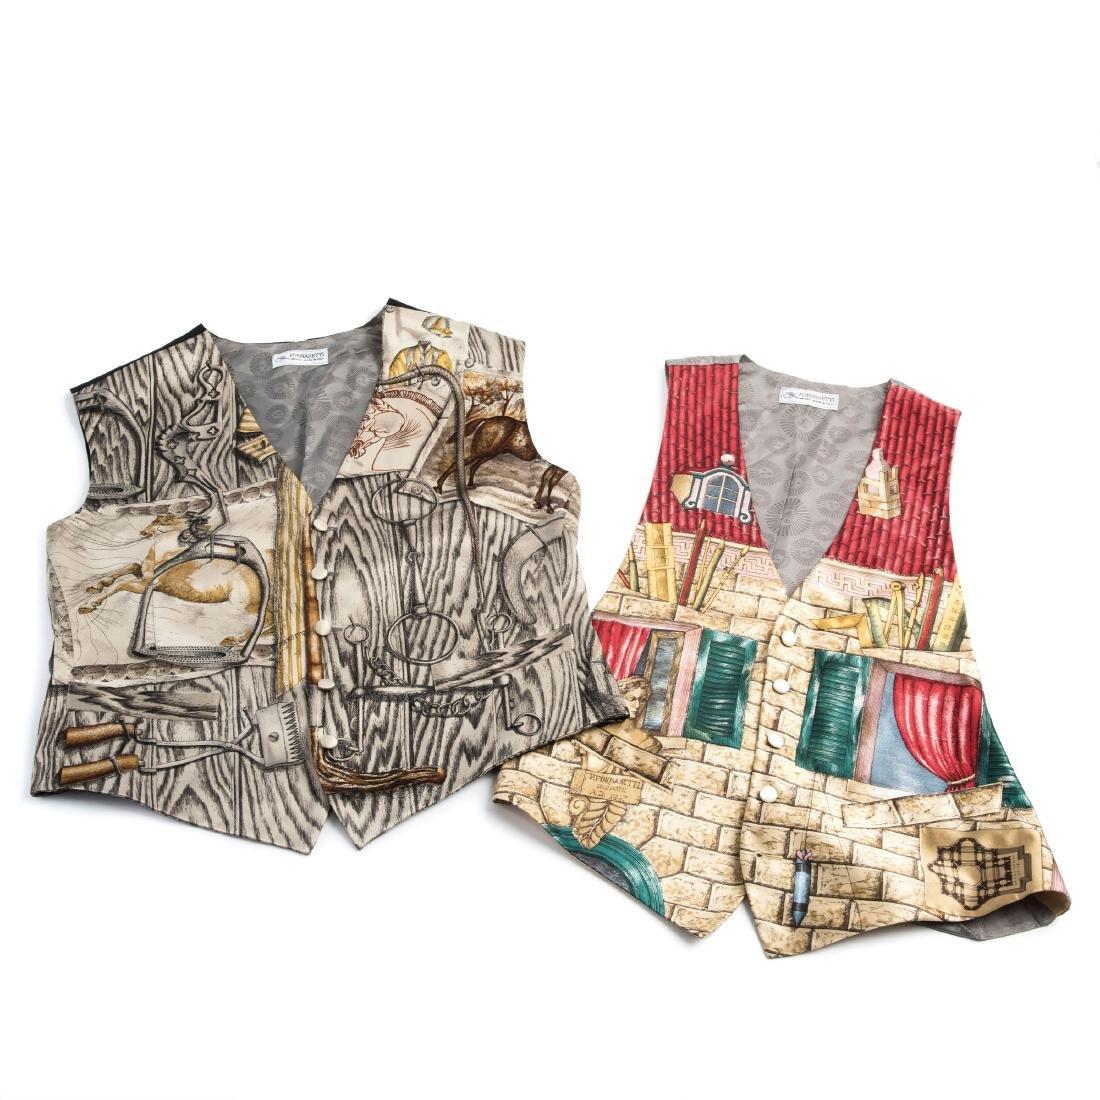 Two waistcoats, 'Architetto' and 'Cavallo', 1990s